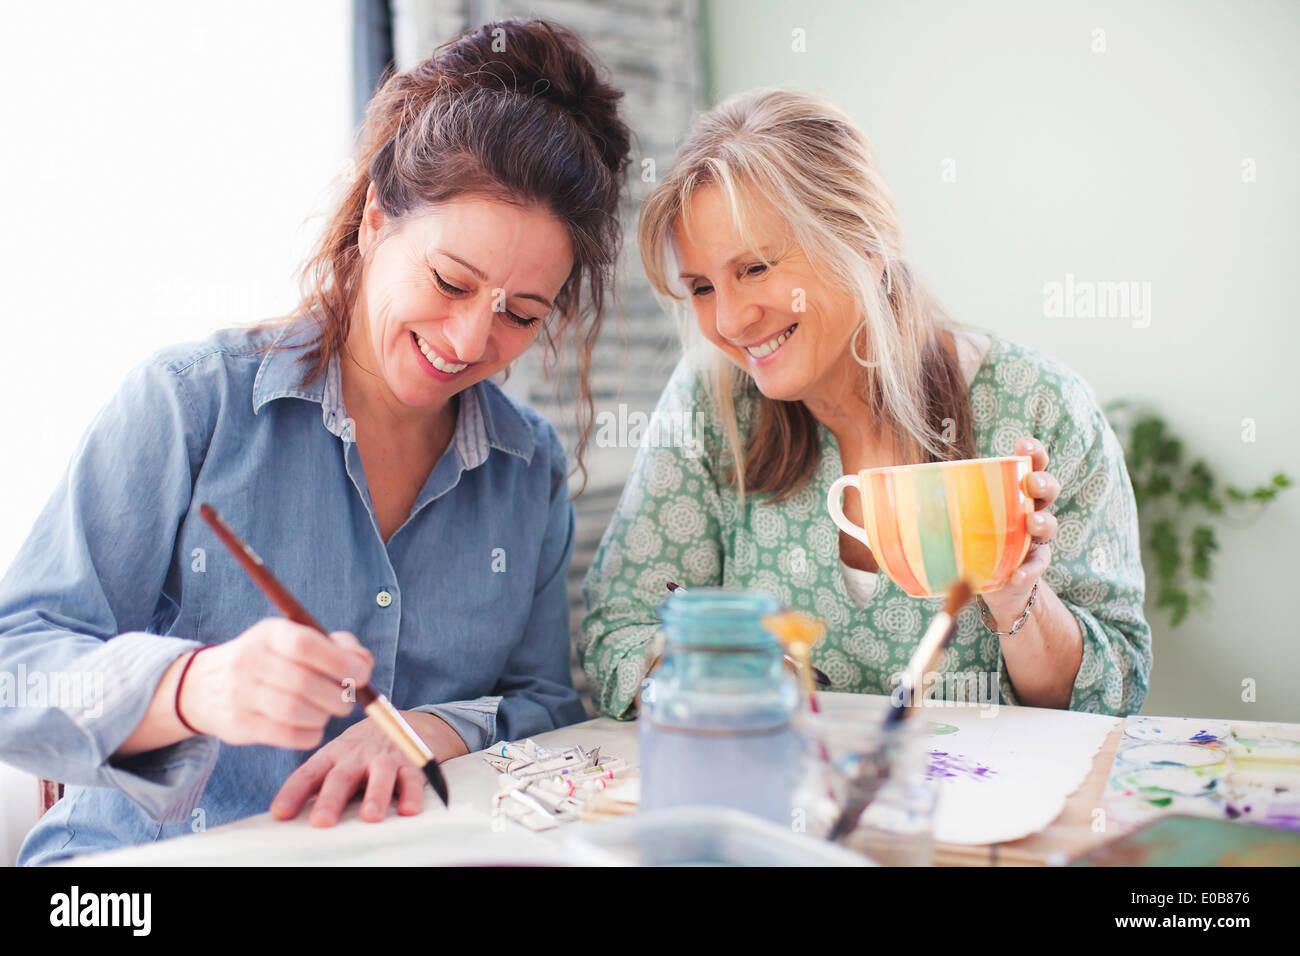 Due femmina matura artisti pittura in studio Immagini Stock